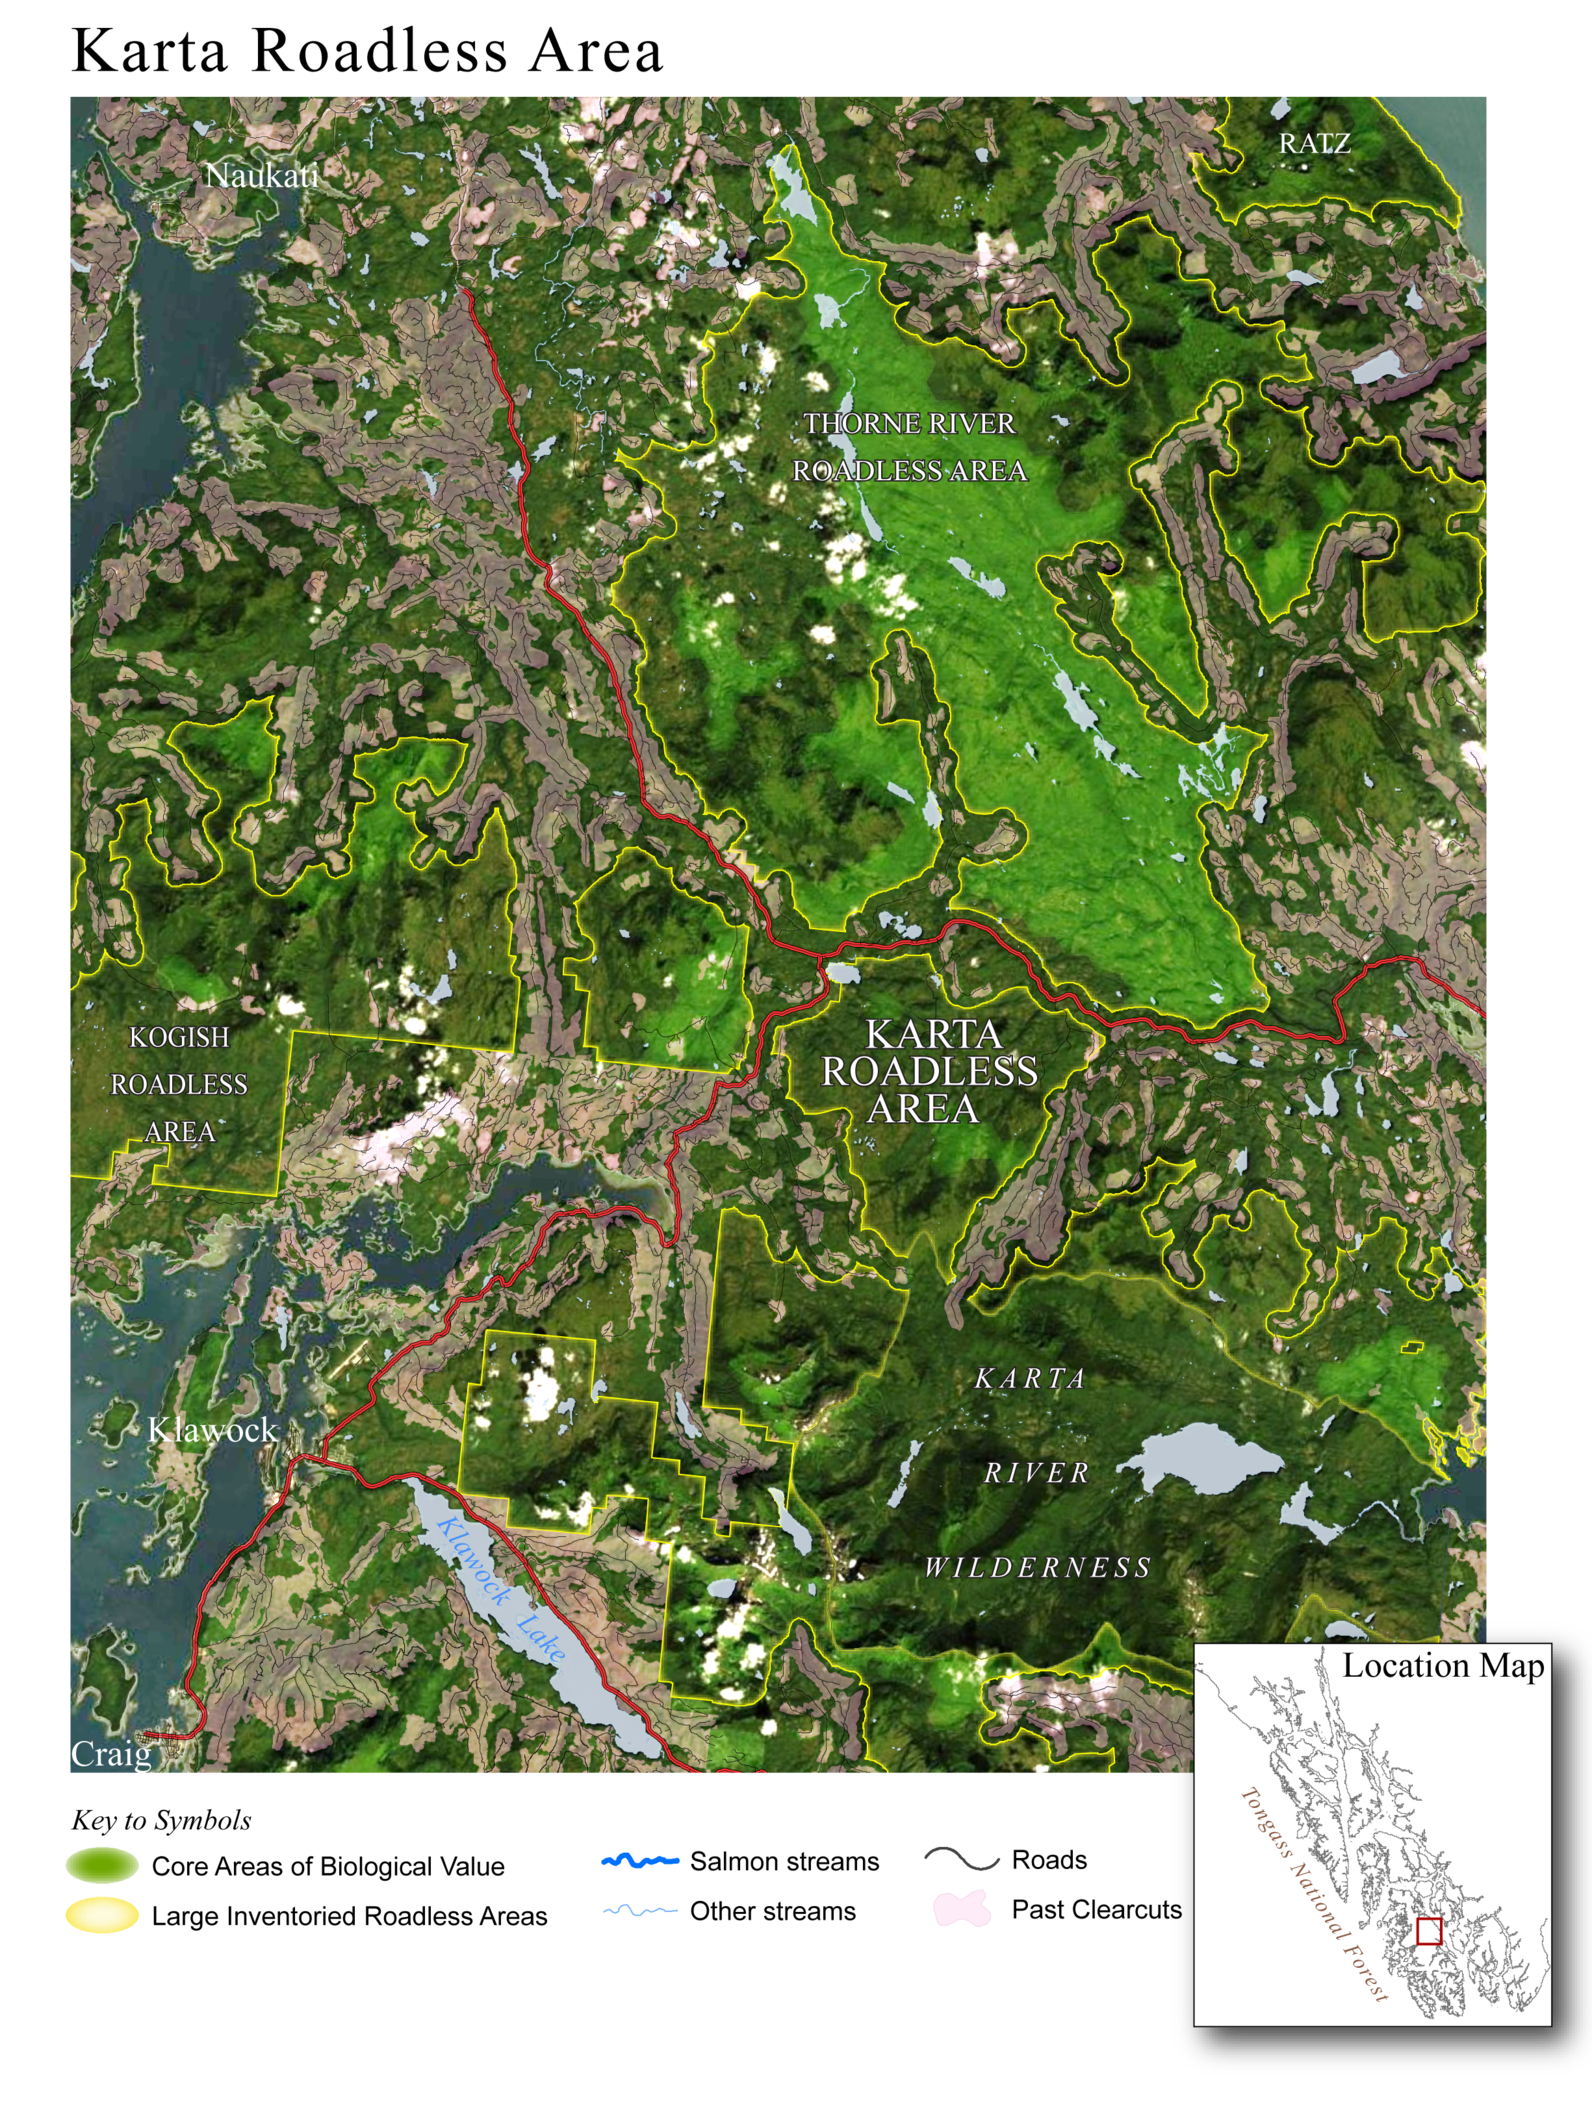 Karta Roadless Area on Prince of Wales Island